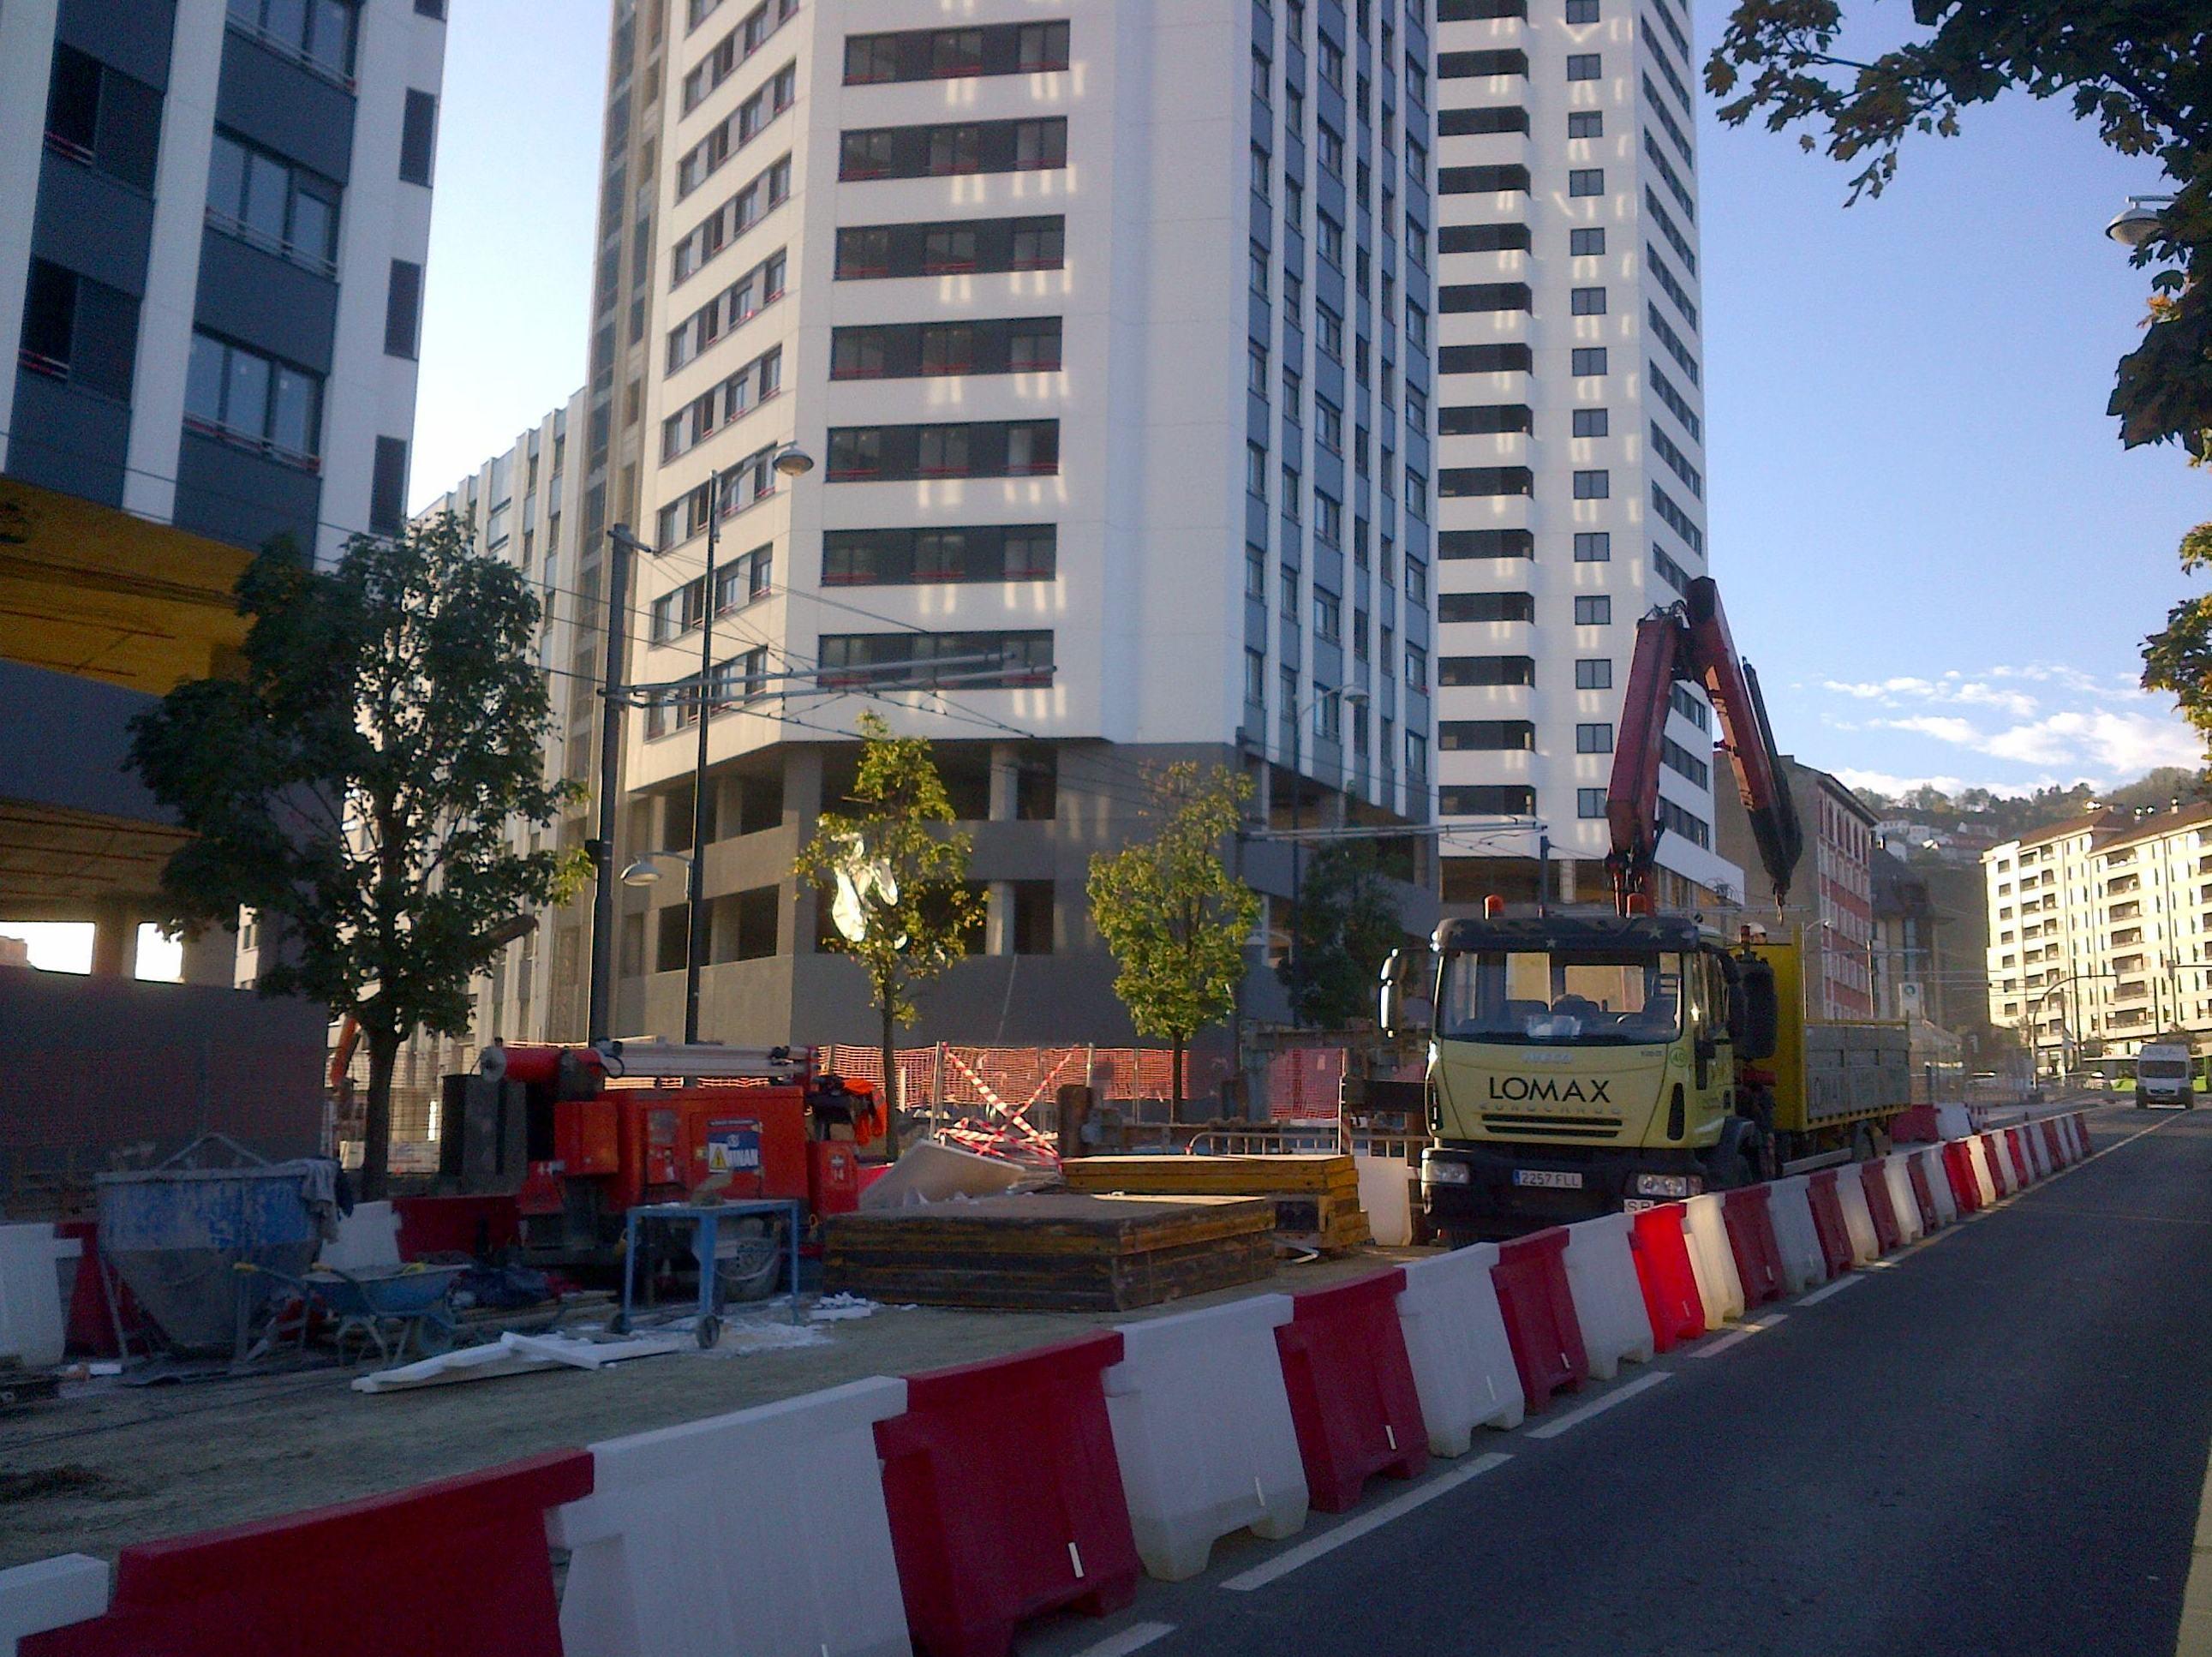 Urbanizacion de garellano Bilbao